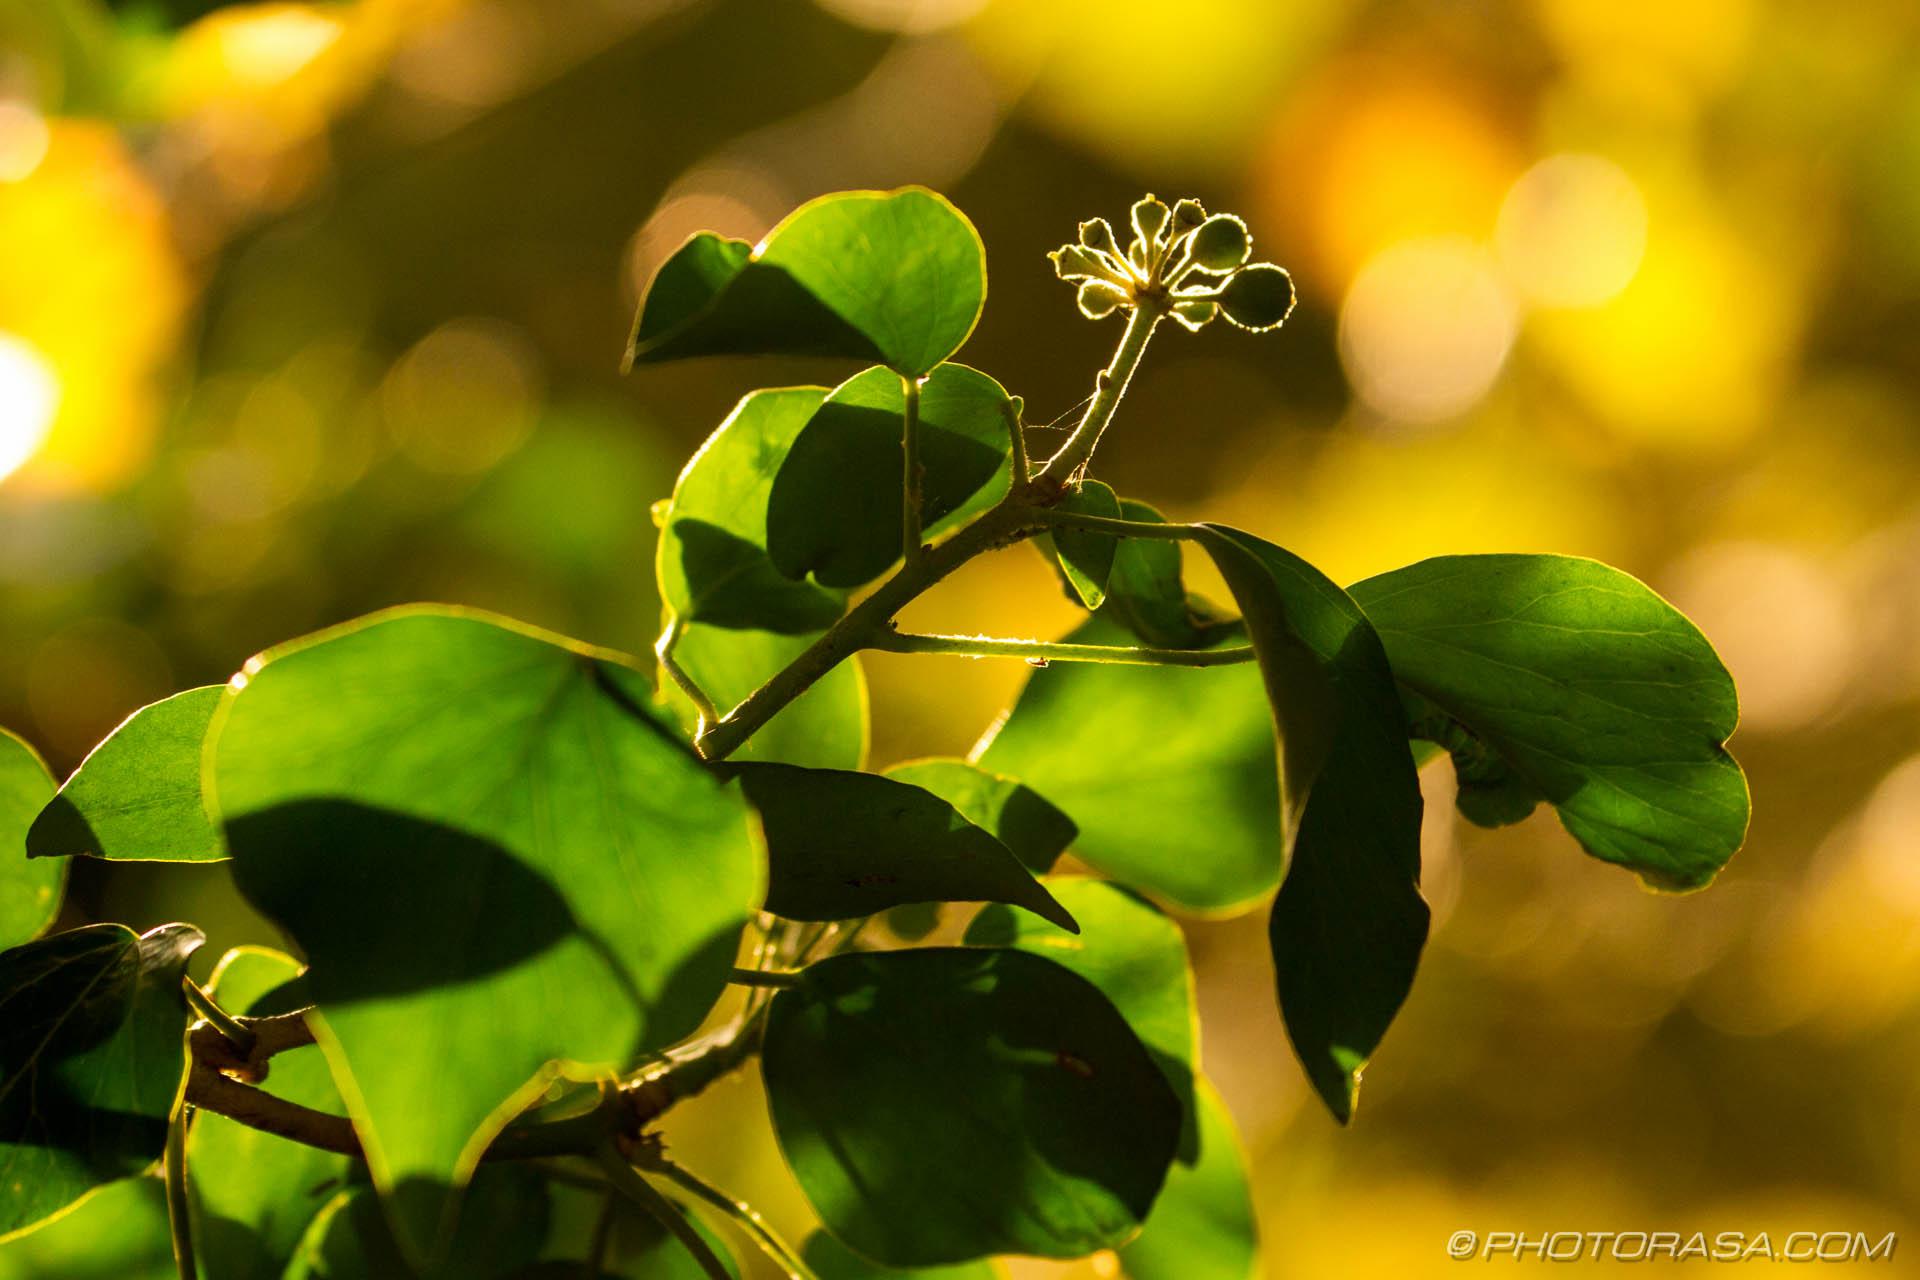 http://photorasa.com/autumn-leaves-sunlight/vine-leaves-at-low-sun-catching-the-light/